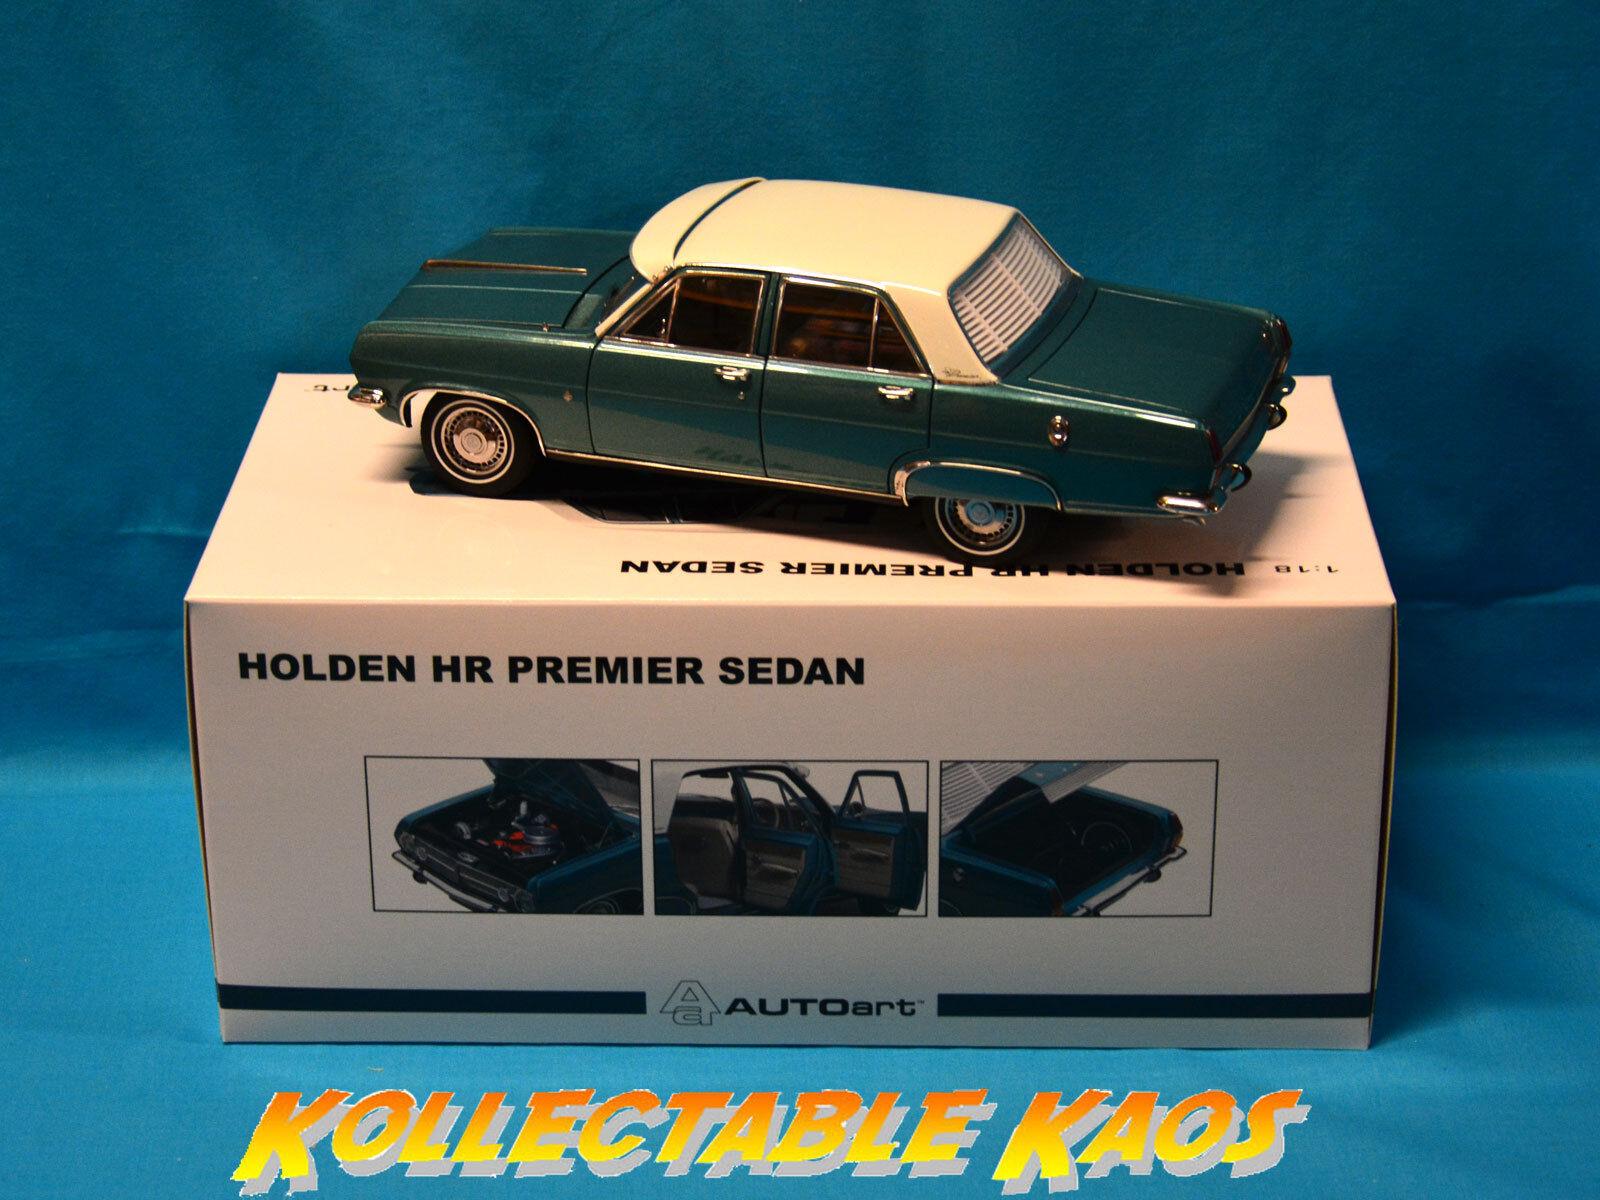 18 biante - 1967 holden hr premier sedan - tennyson türkis - neubau